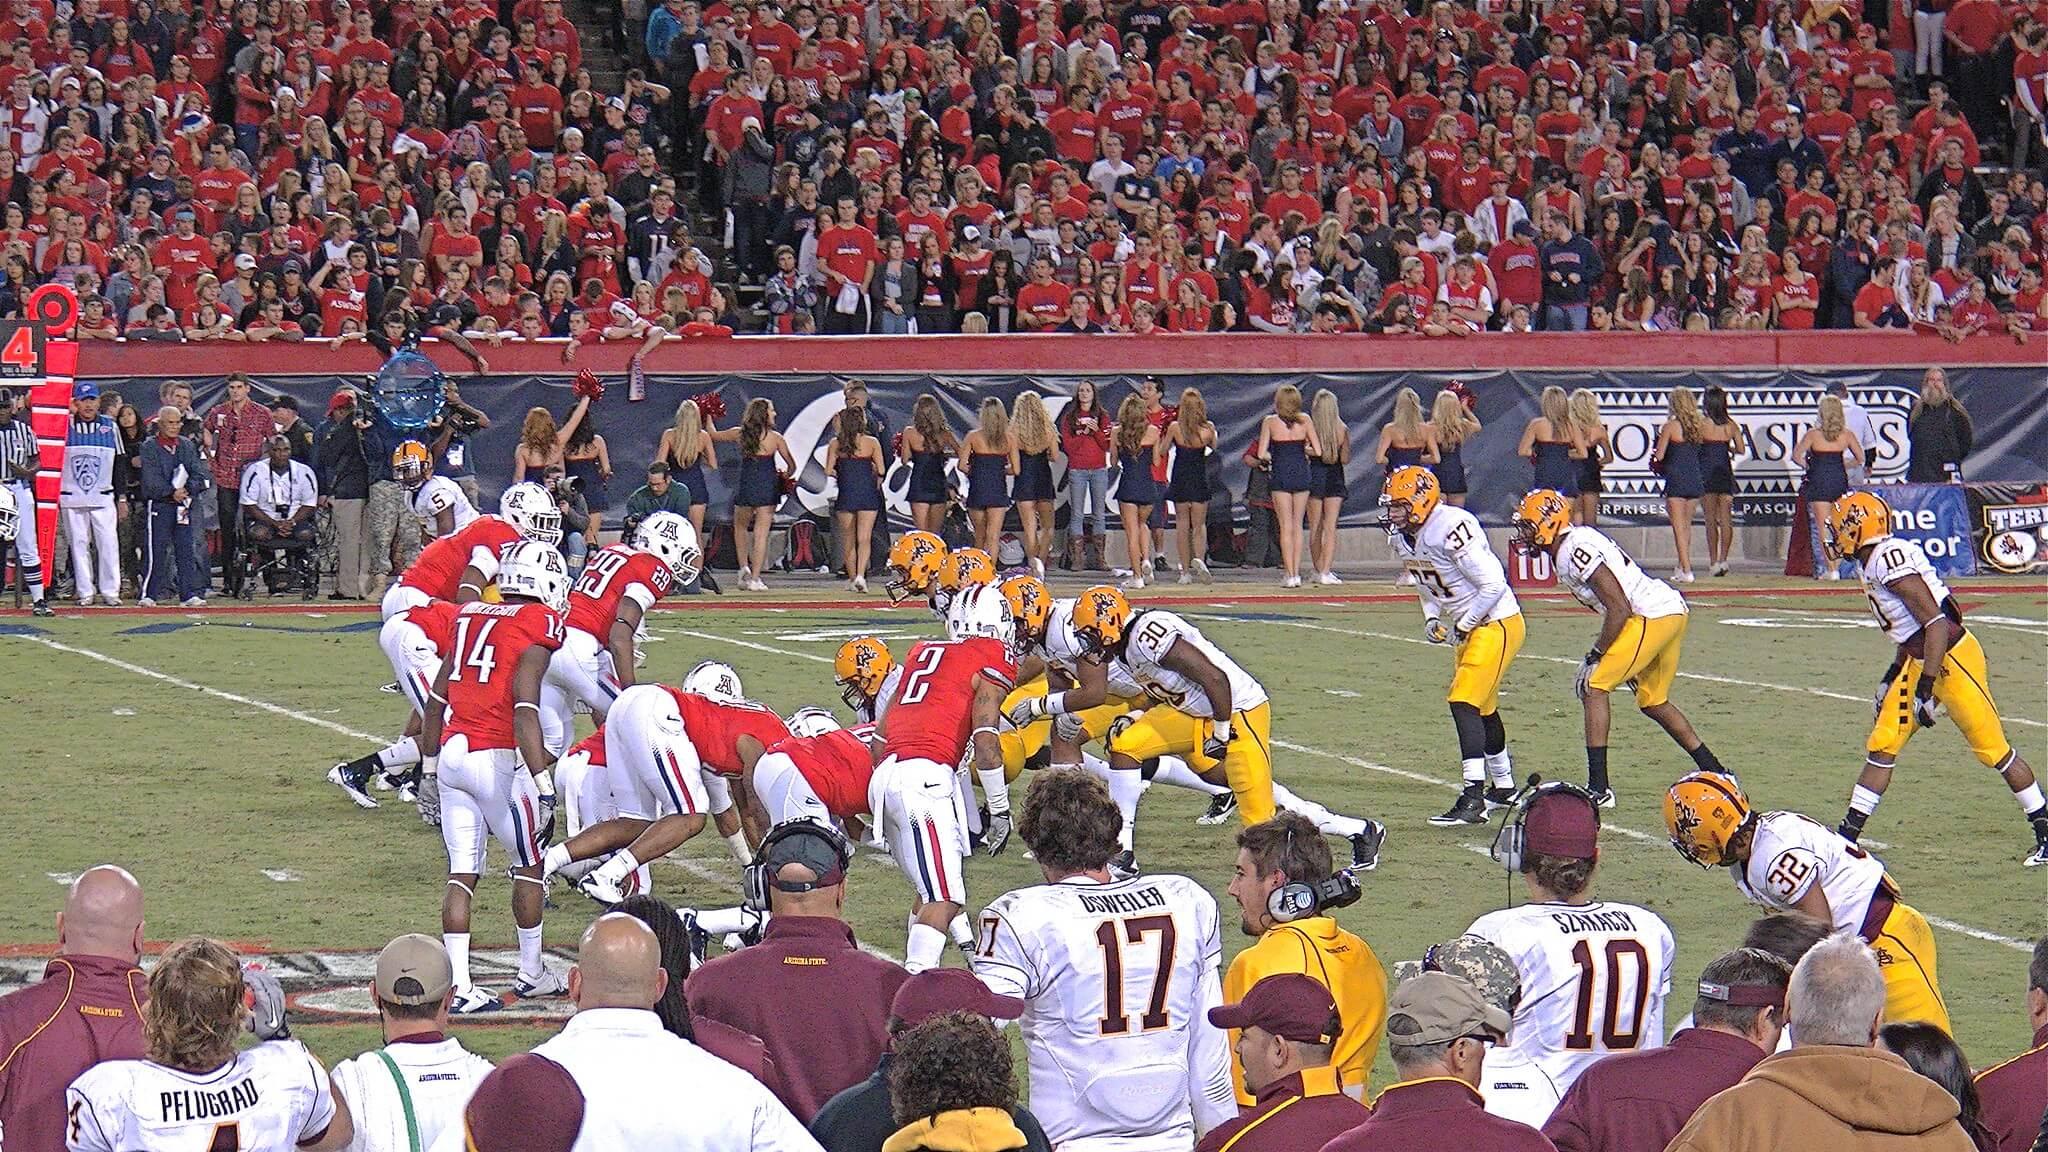 Arizona vs Arizona State Territorial Cup rivalry